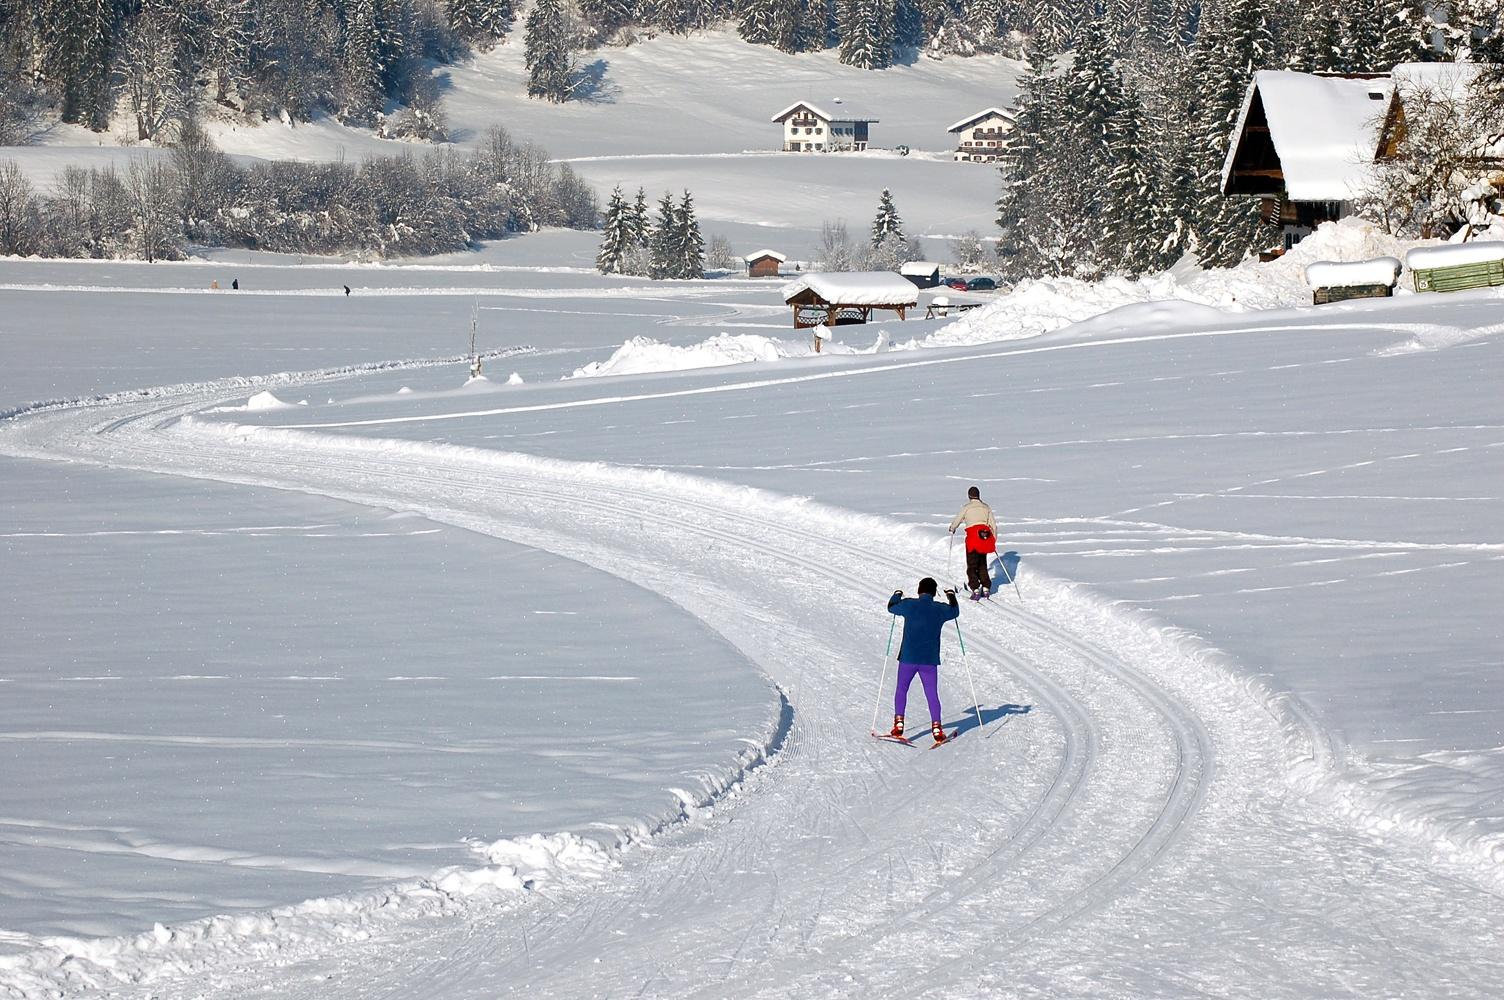 Langlaufzentrum Hochtal Mühlau, Kiefersfelden